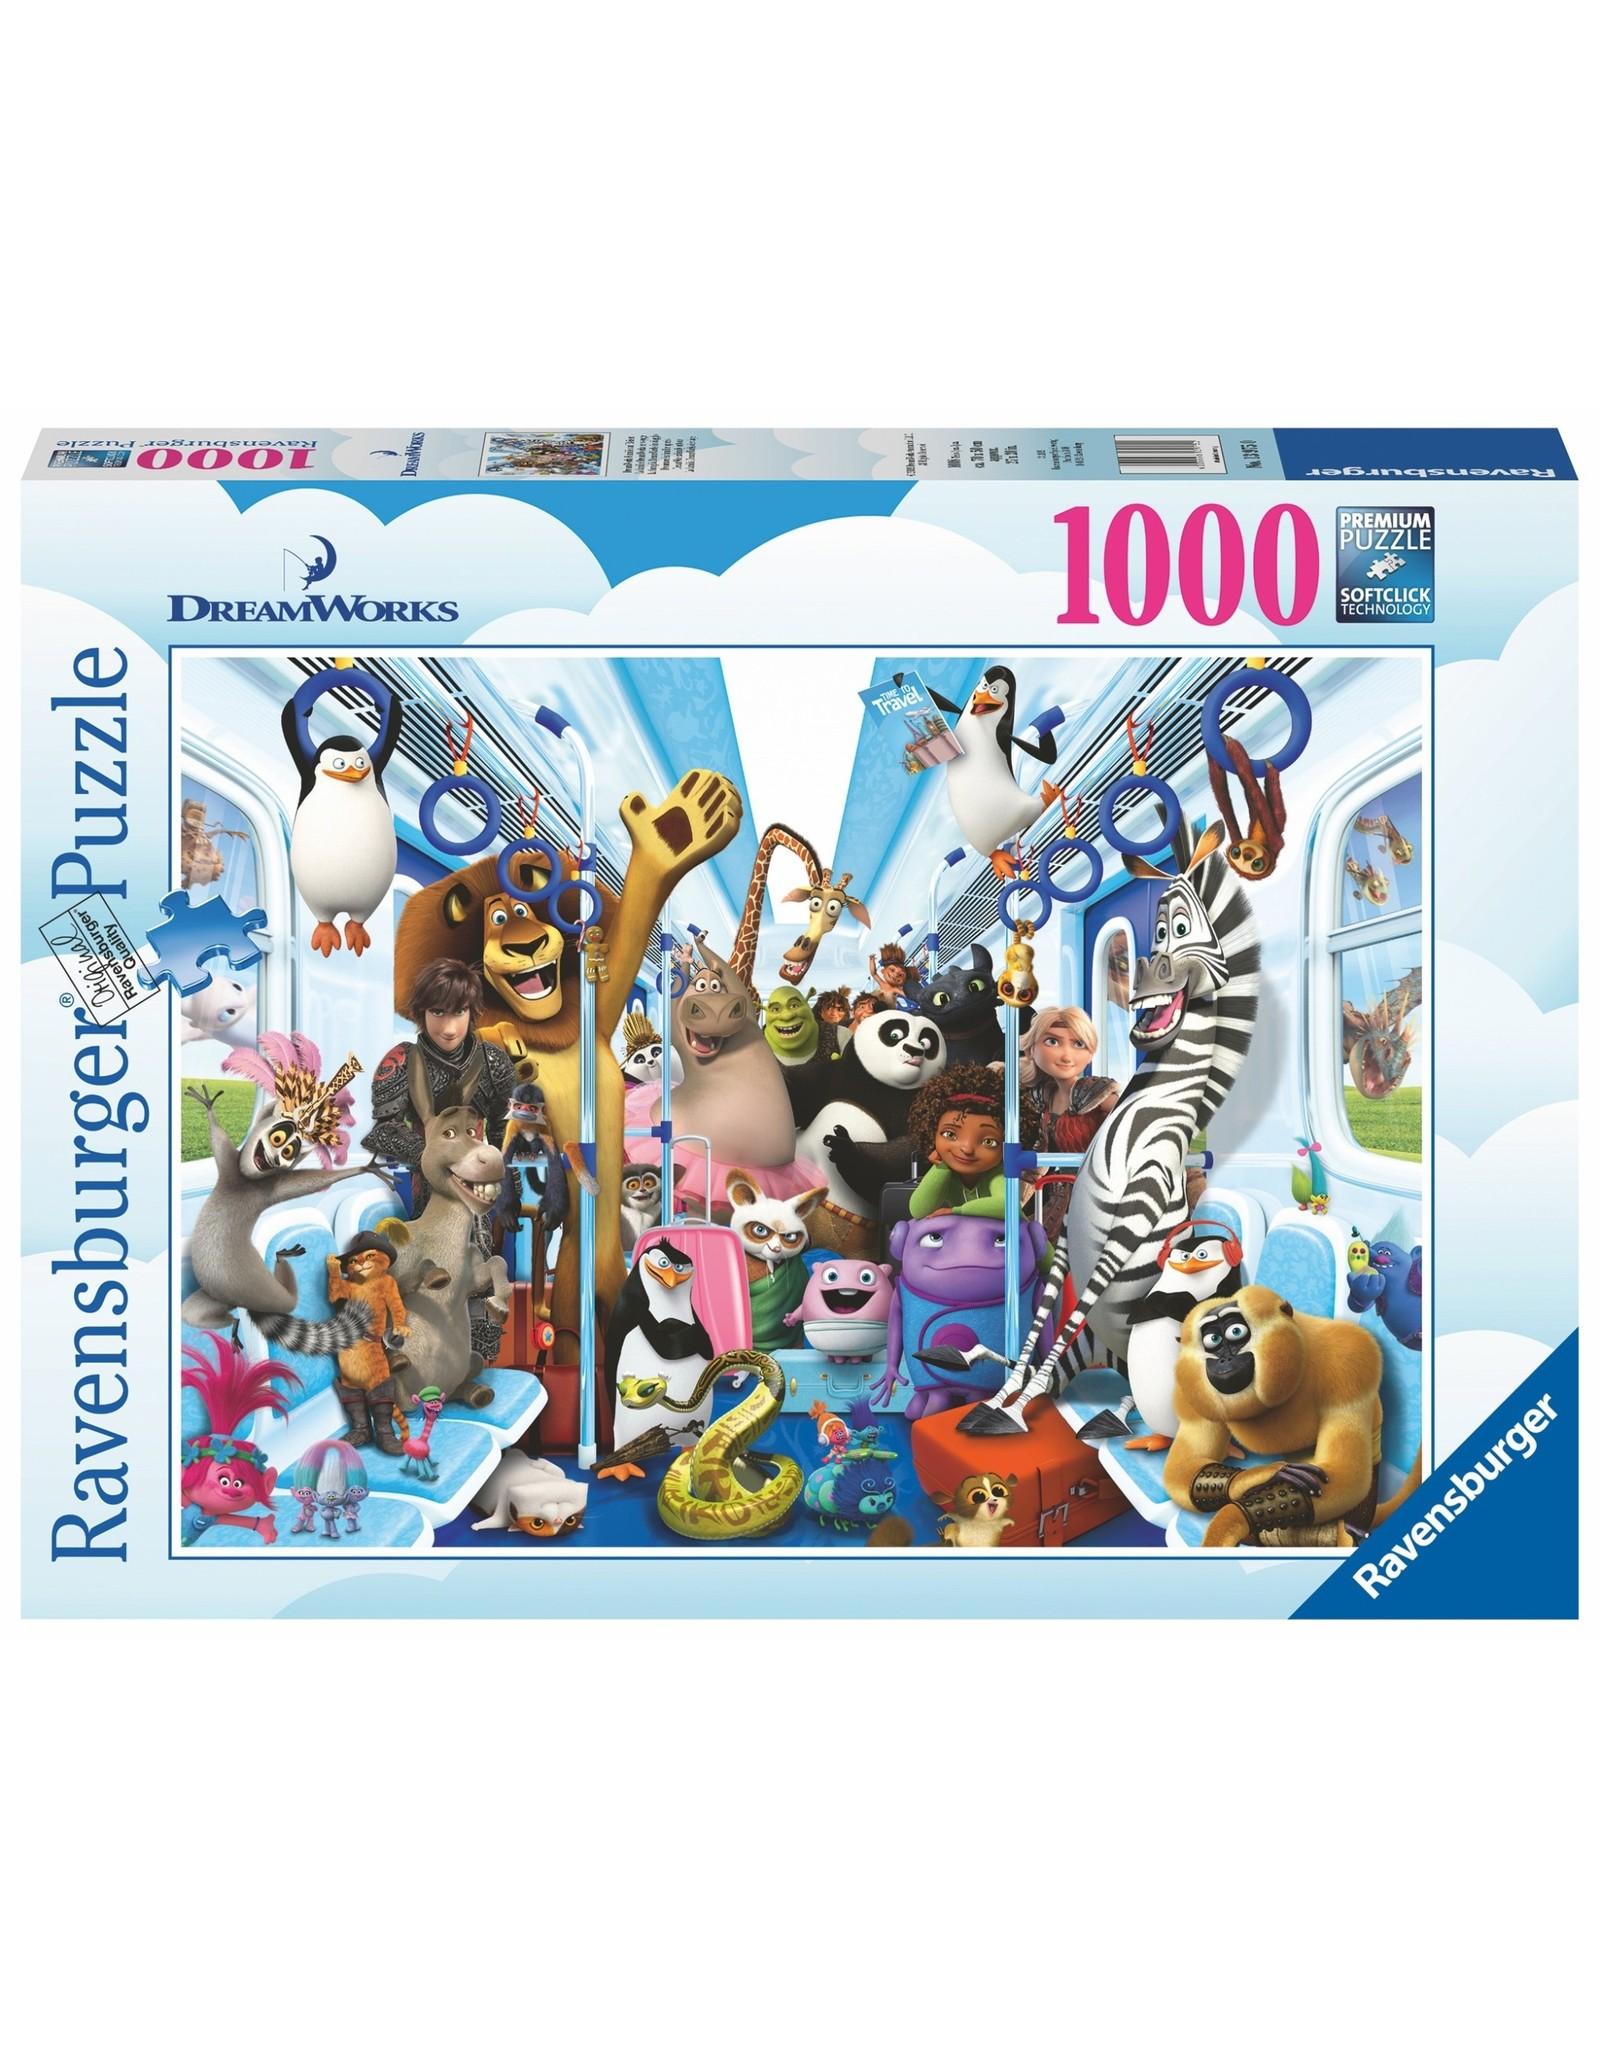 Ravensburger DREAMWORKS Puzzle 1000P - Travel Family